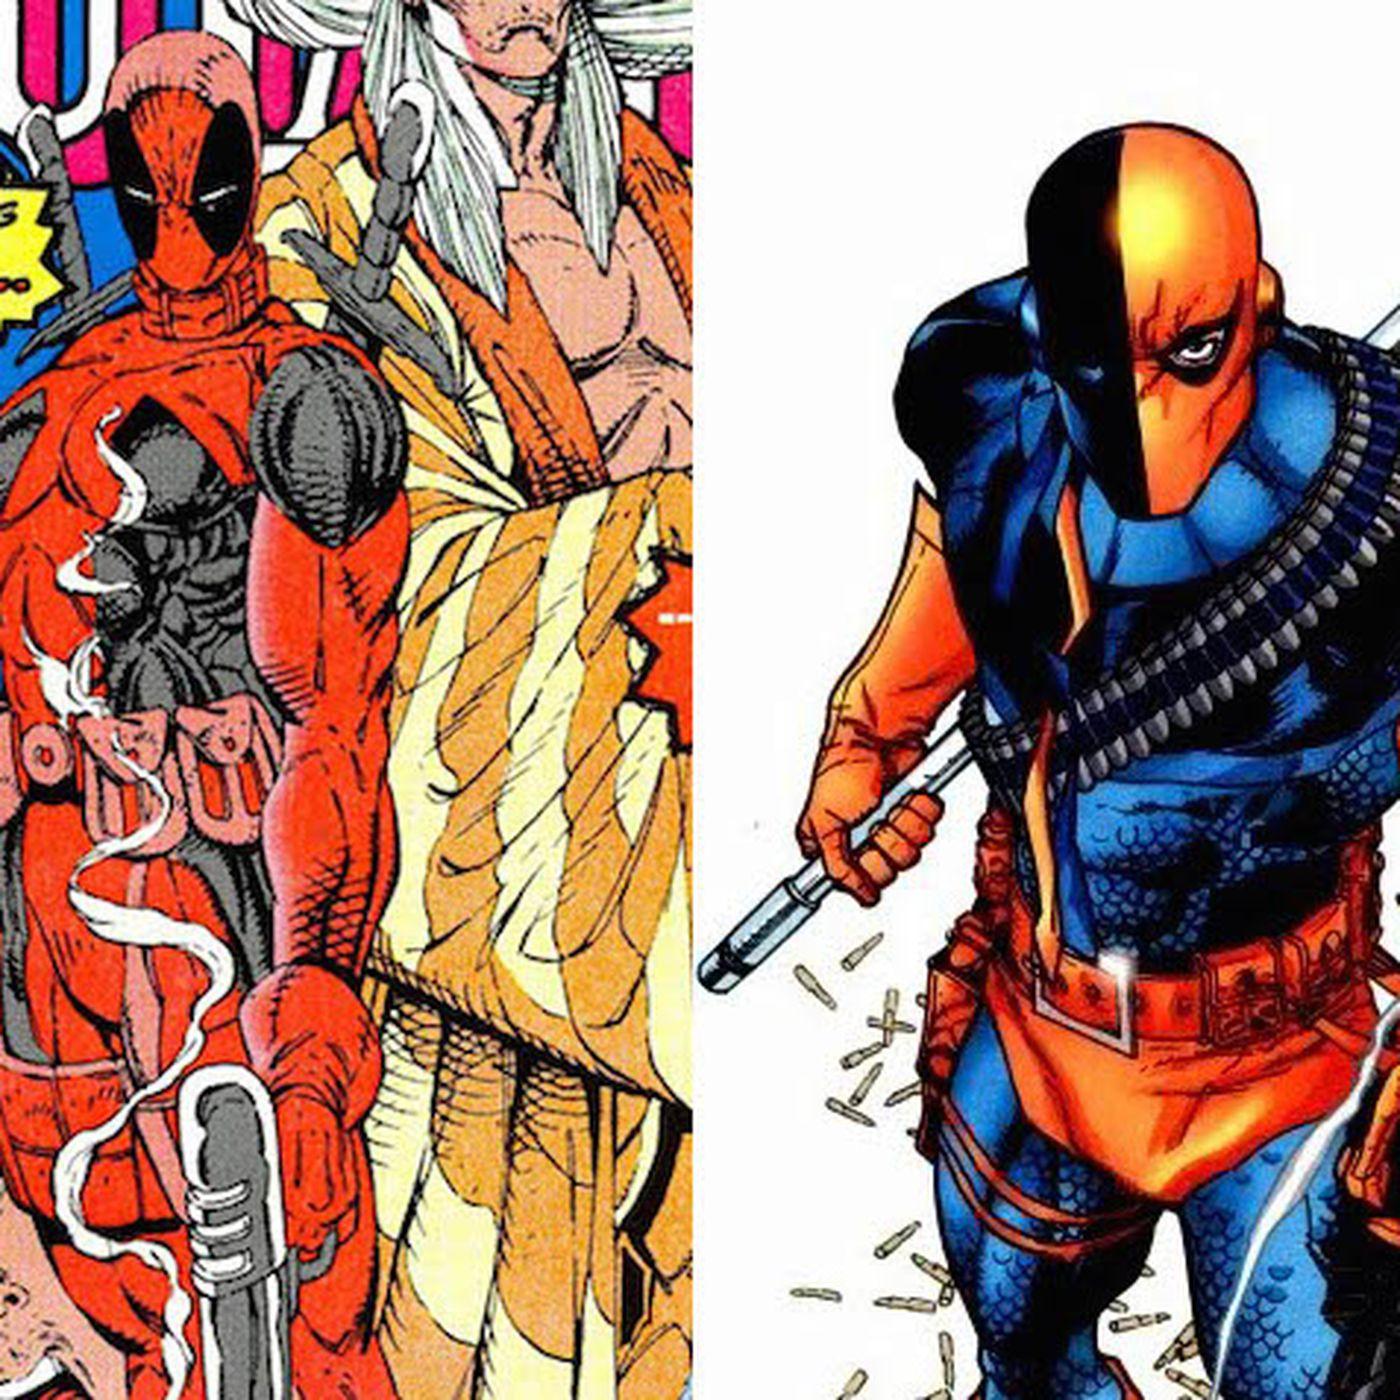 Deadpool was originally a ripoff of a DC Comics villain